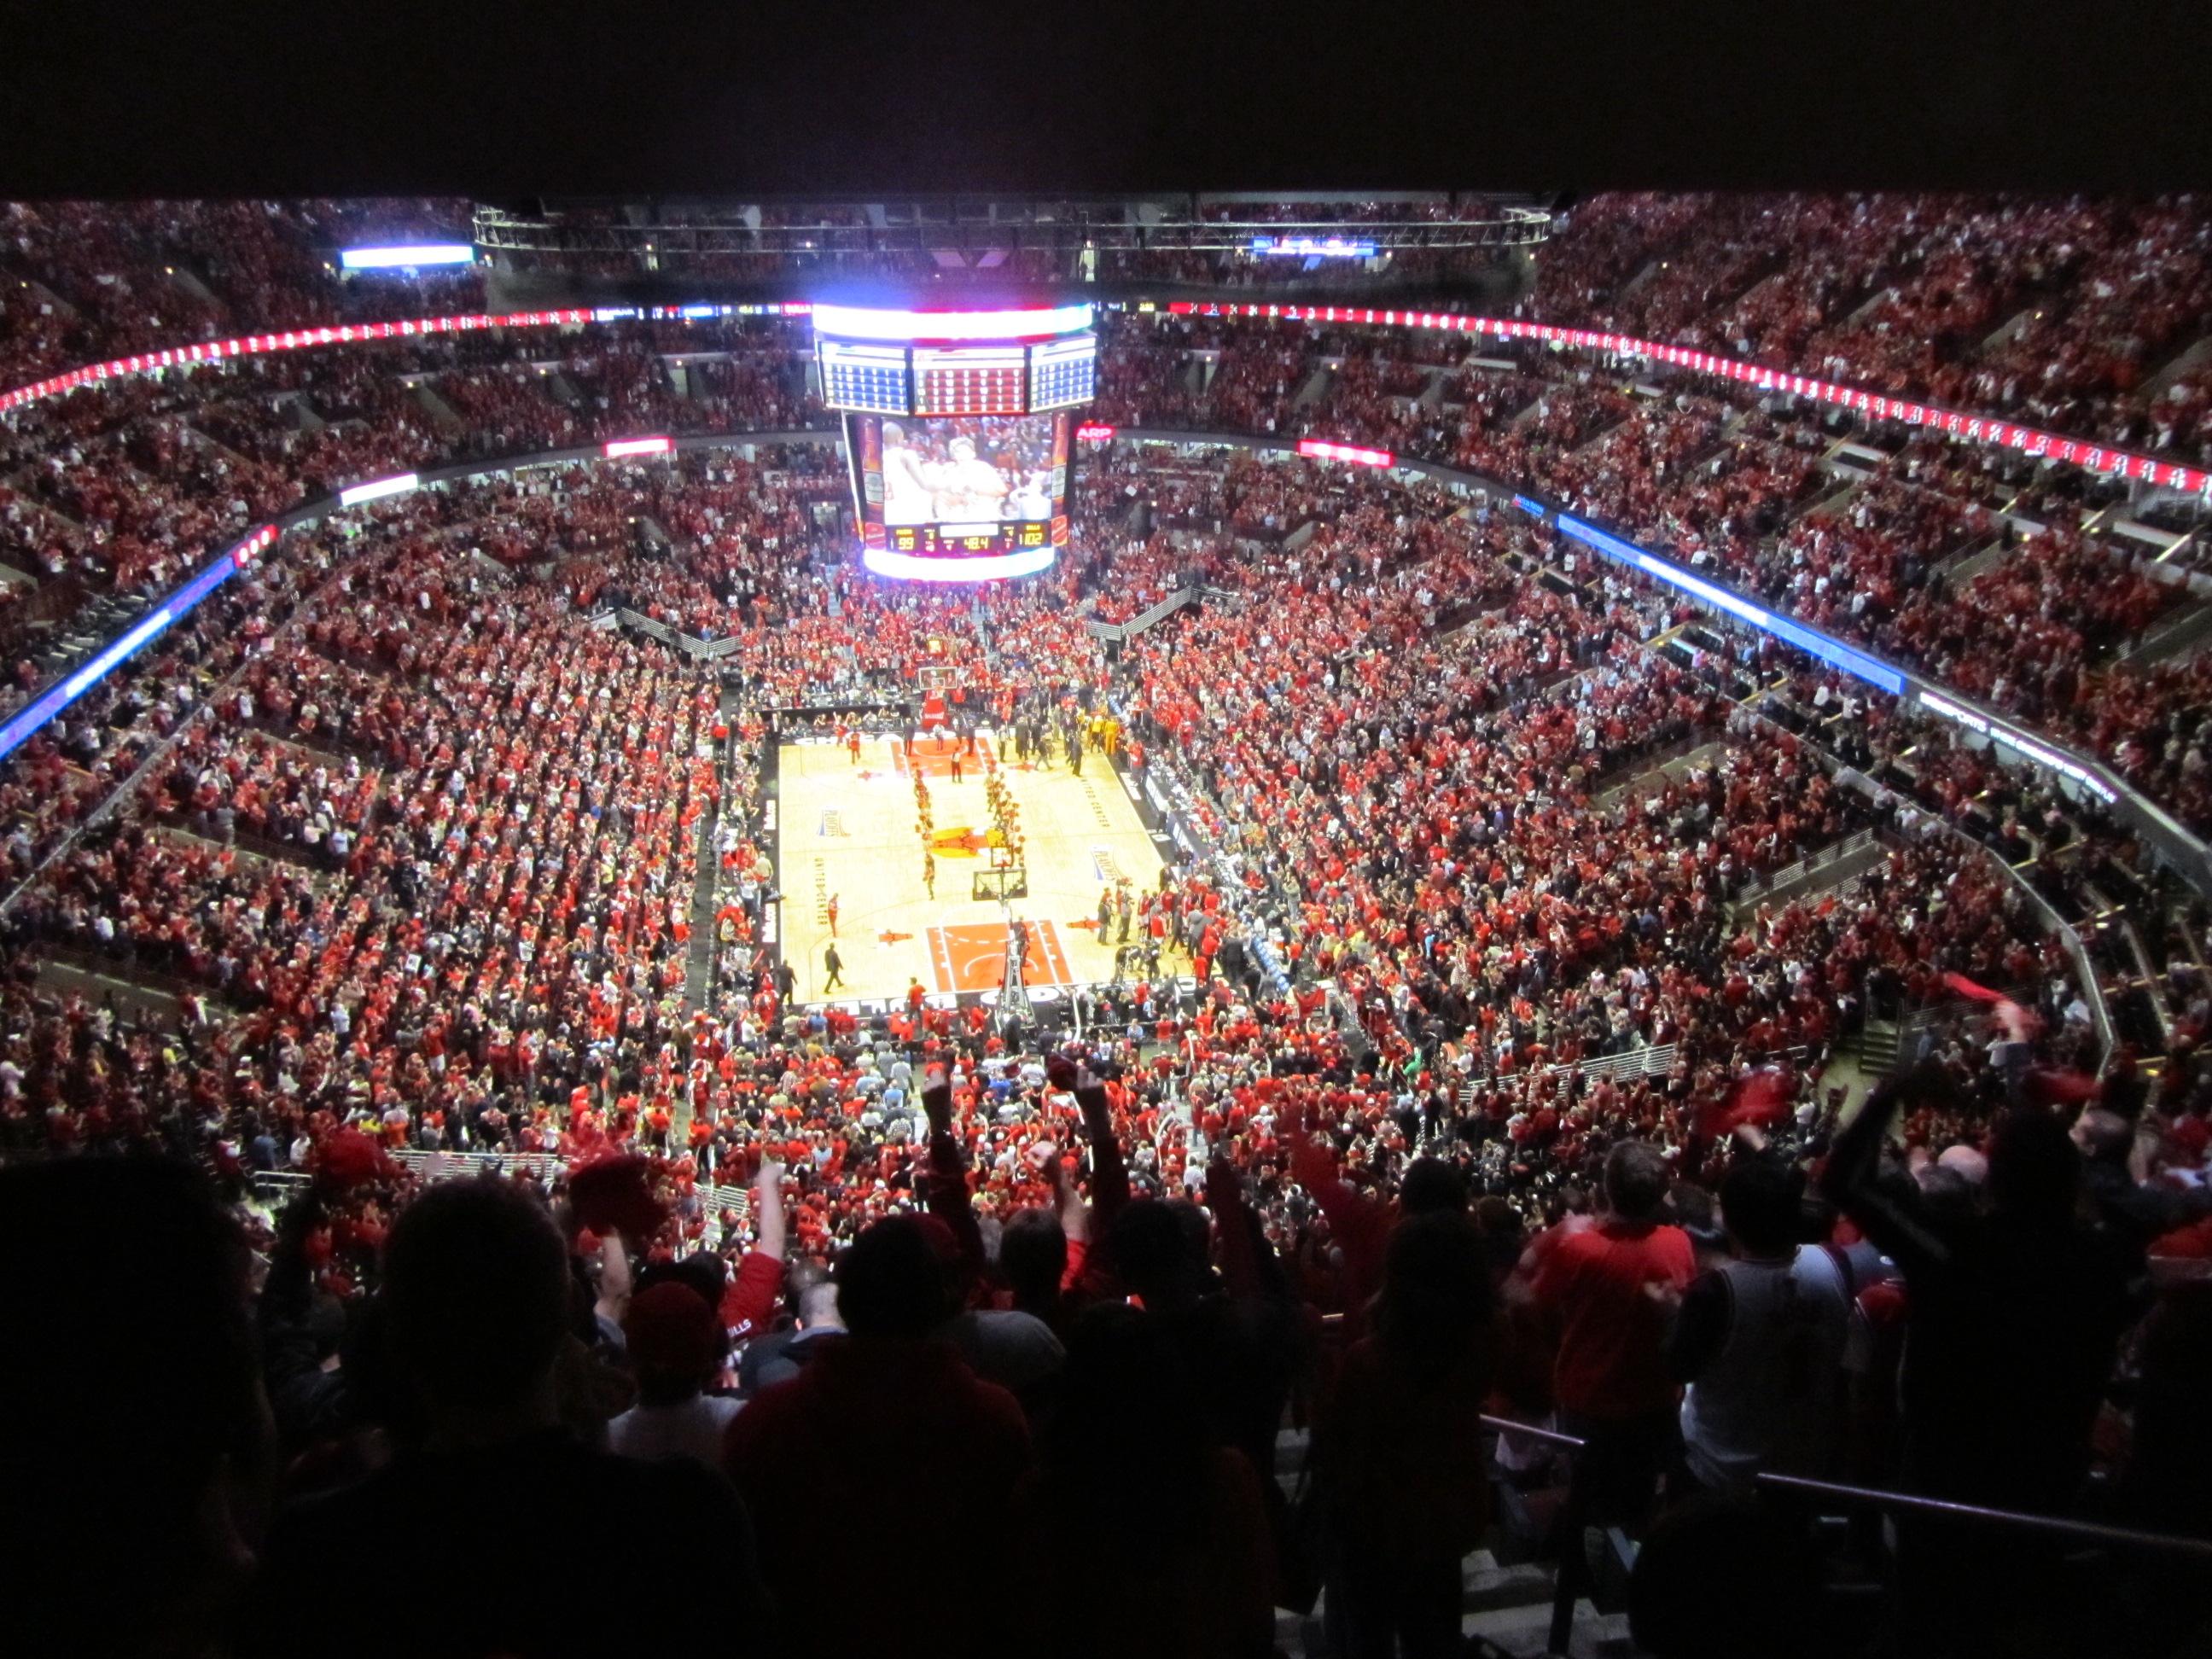 File:Chicago Bulls Playoffs 2011.jpg - Wikimedia Commons